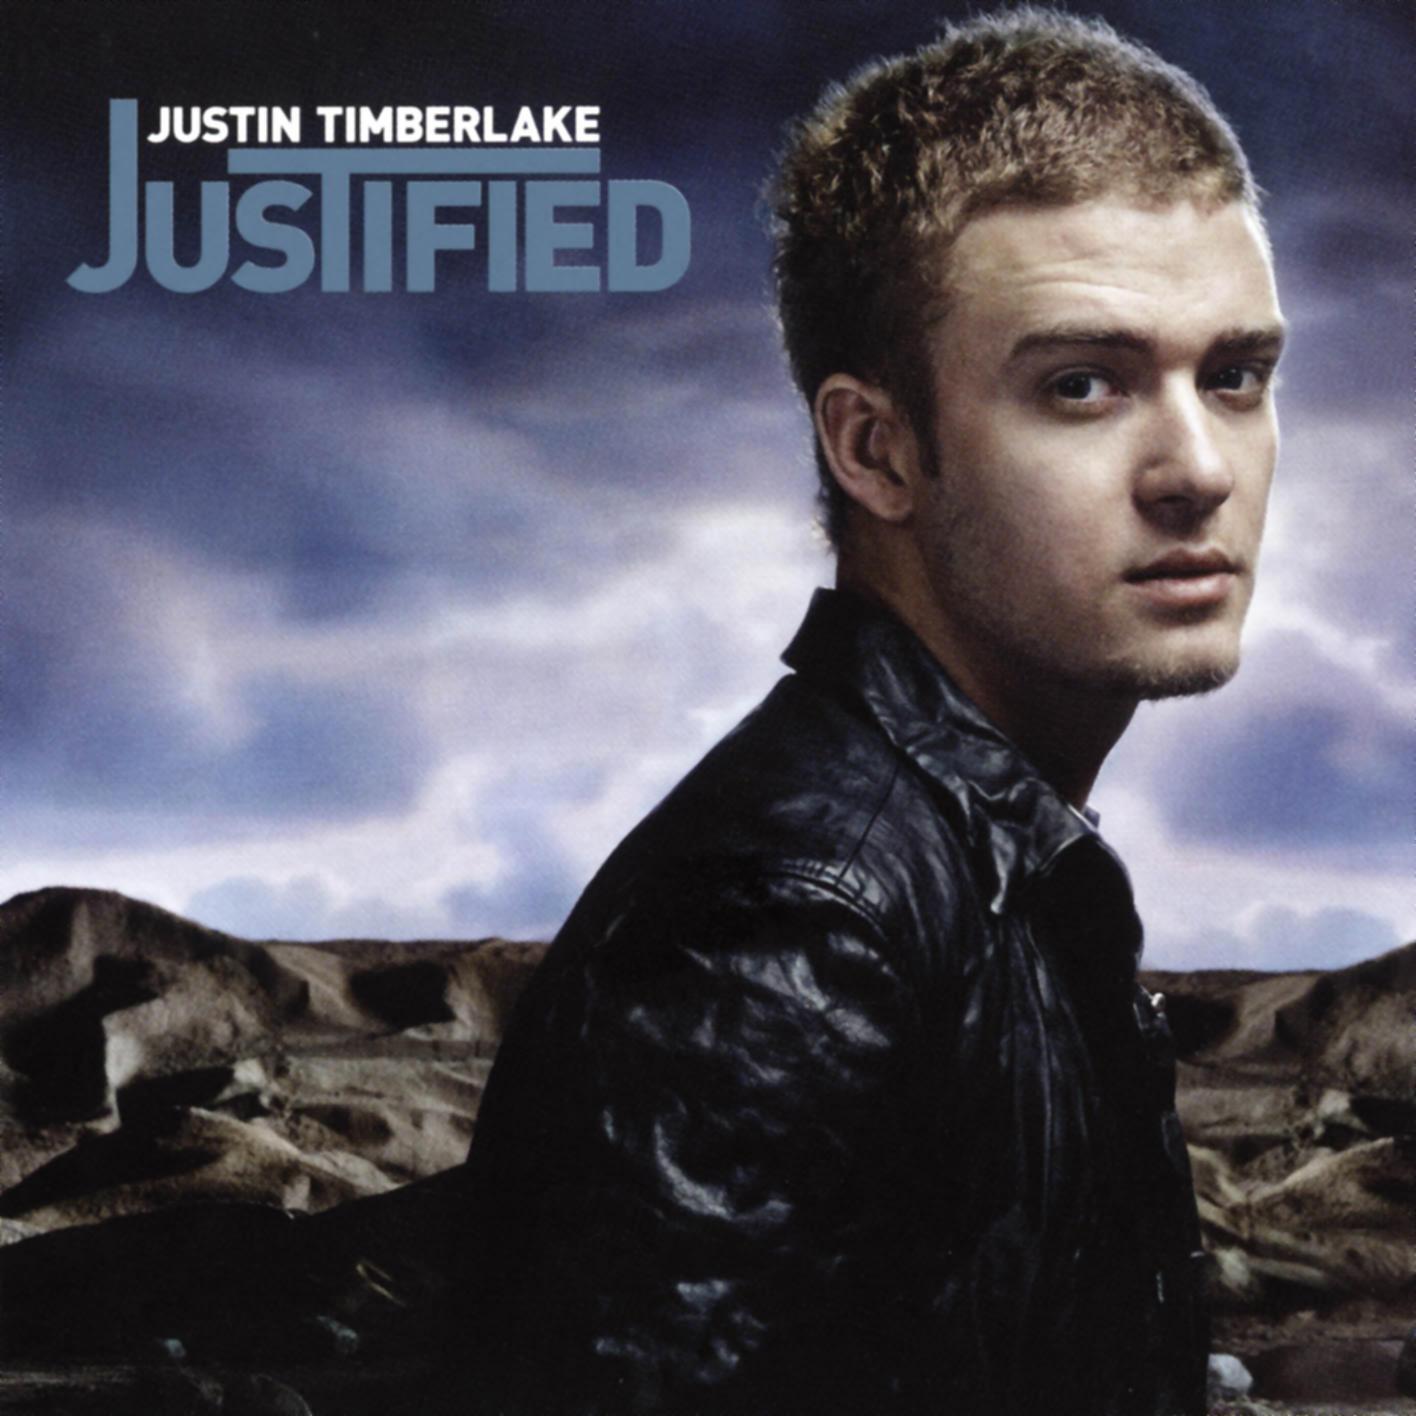 http://1.bp.blogspot.com/-BHDutYKmLi8/T7GFe056rrI/AAAAAAAAC38/AEq_5O7AnqU/s1600/Justin_Timberlaken_Justified.jpg